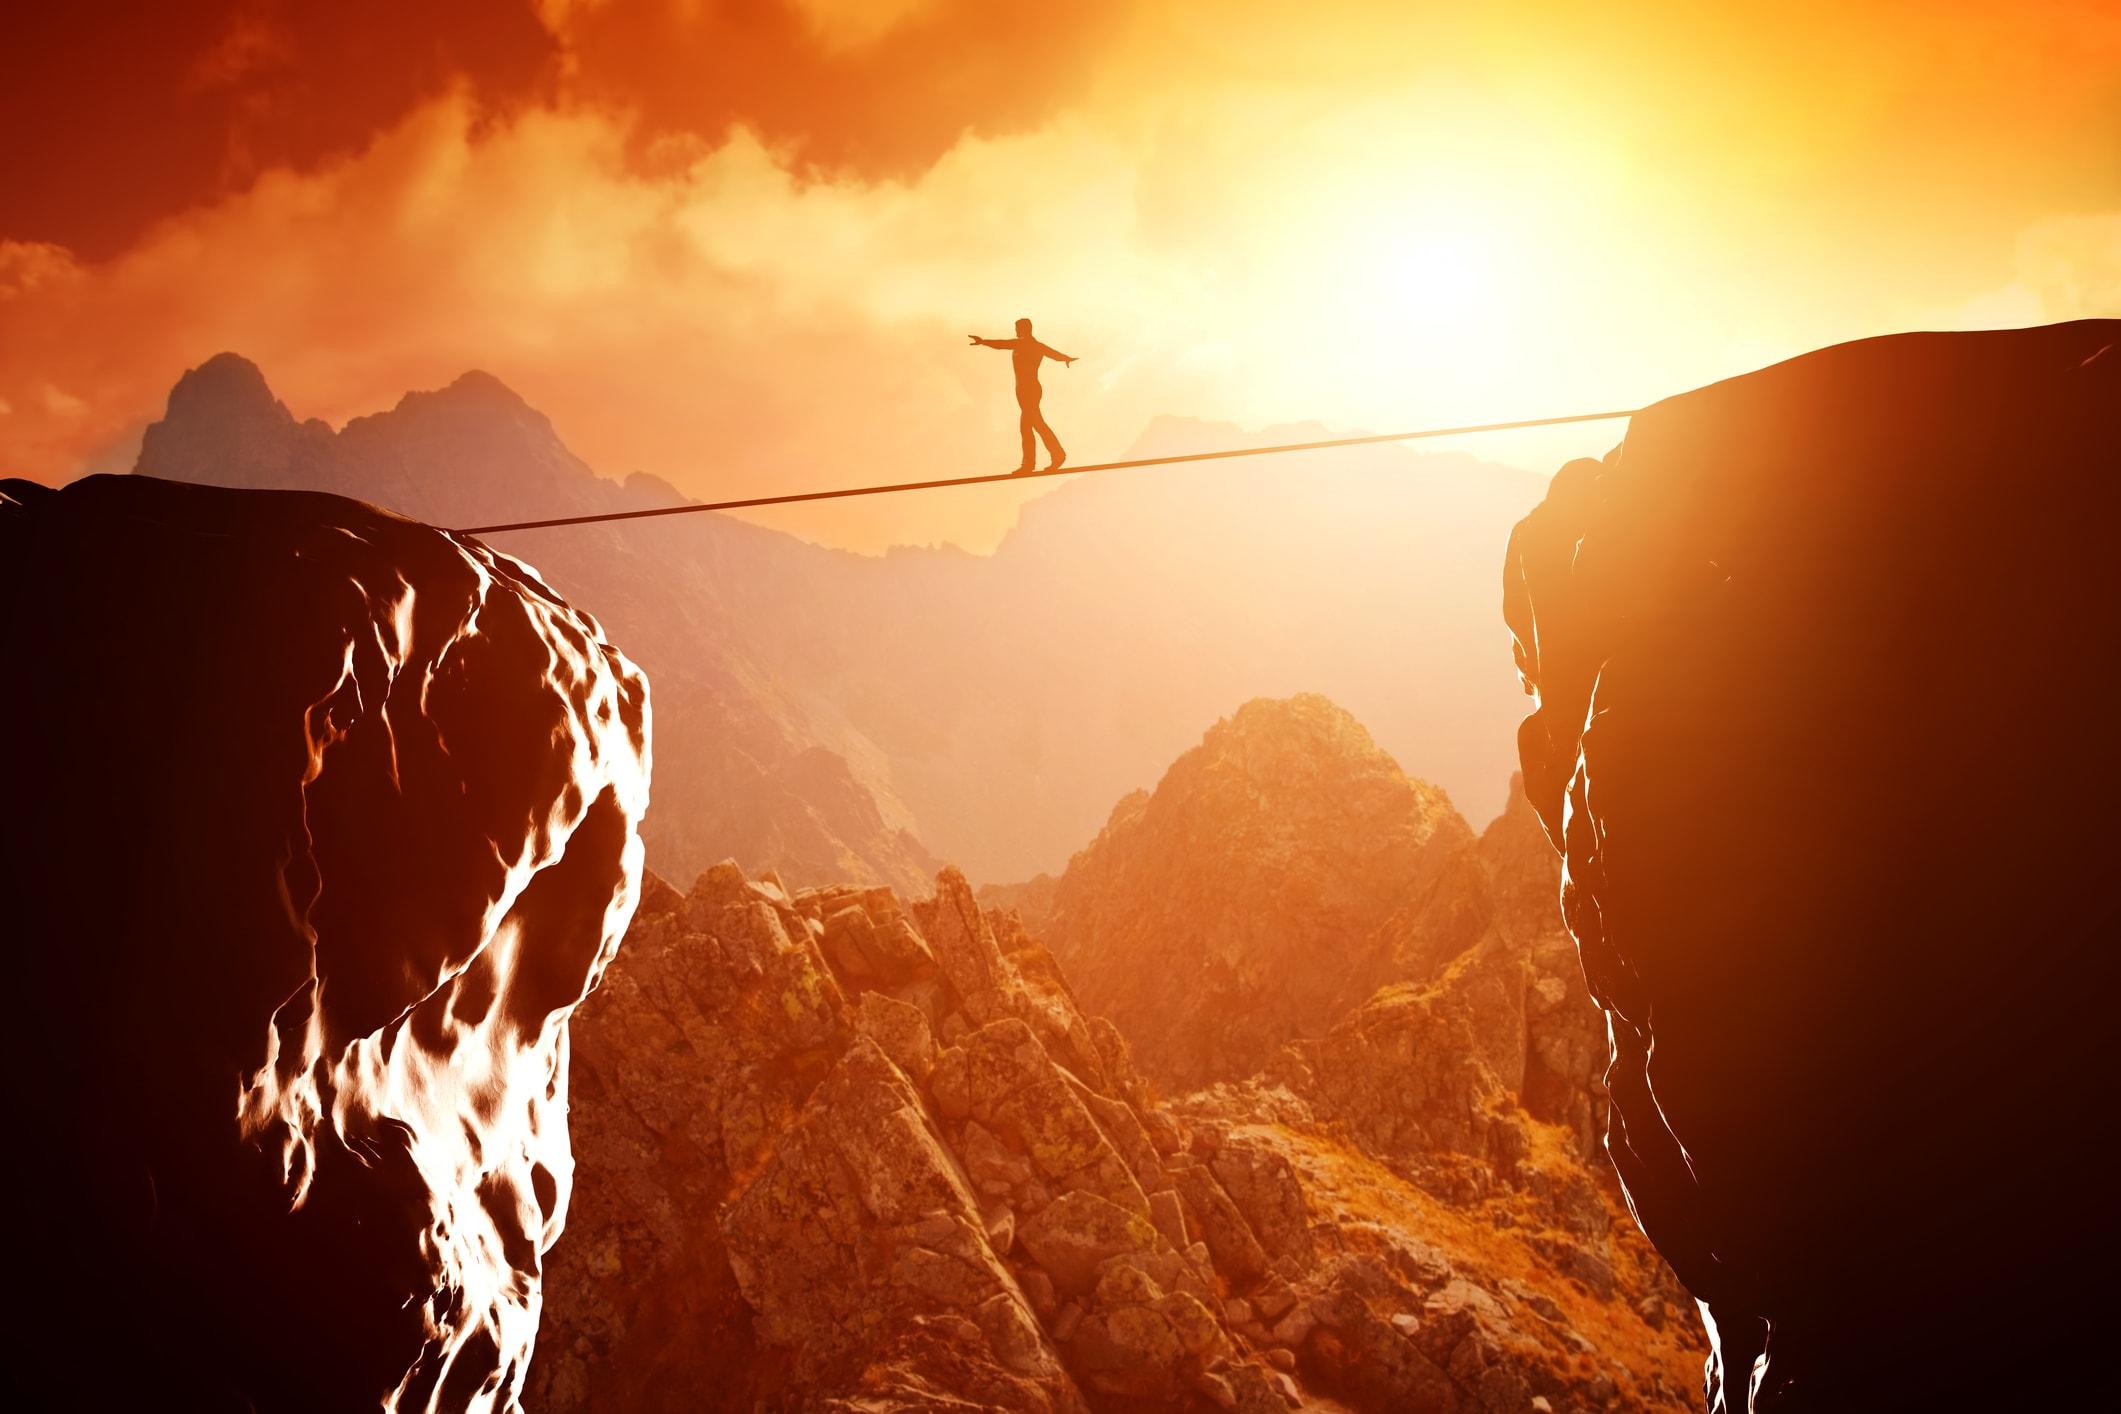 Mann auf dem Seil